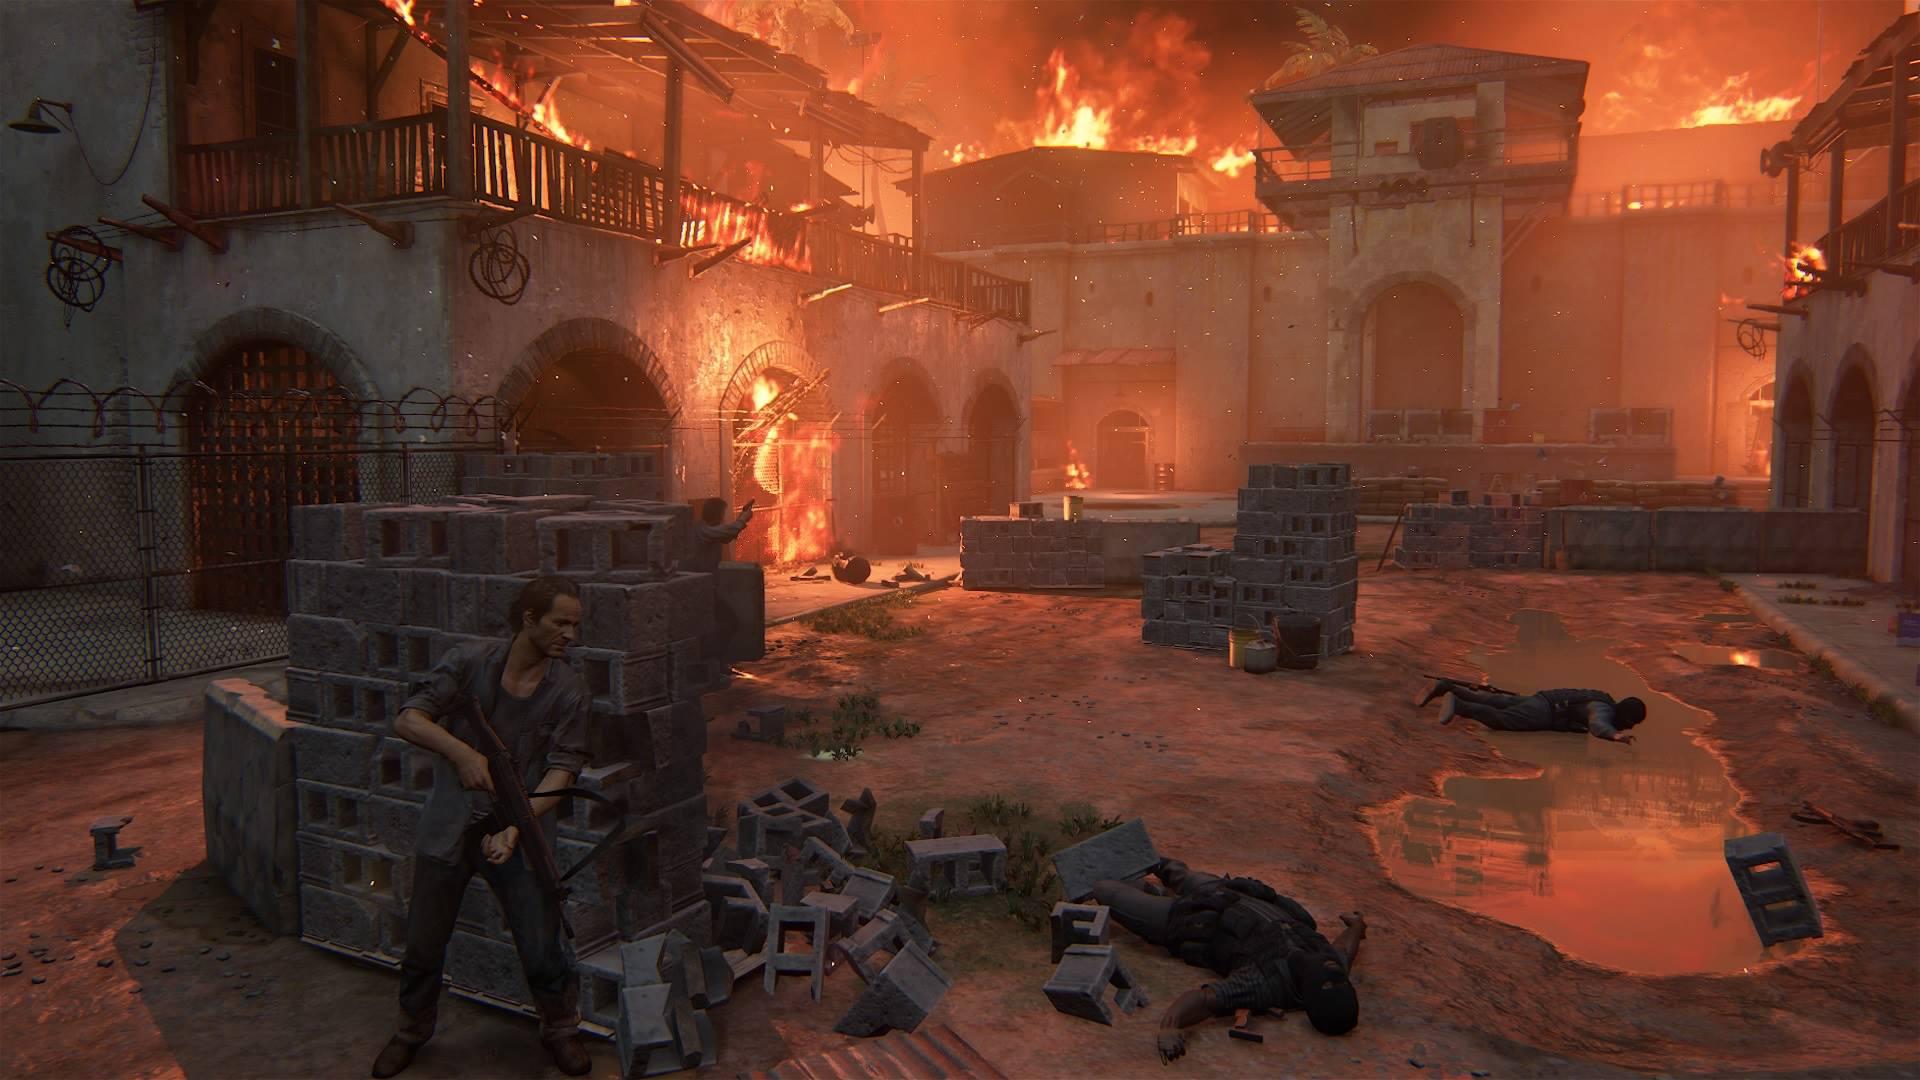 Новостища найн! Коллекционки Titanfall 2!  PS4K реальна ! Трейлер Call of Ctulhu! - Изображение 1